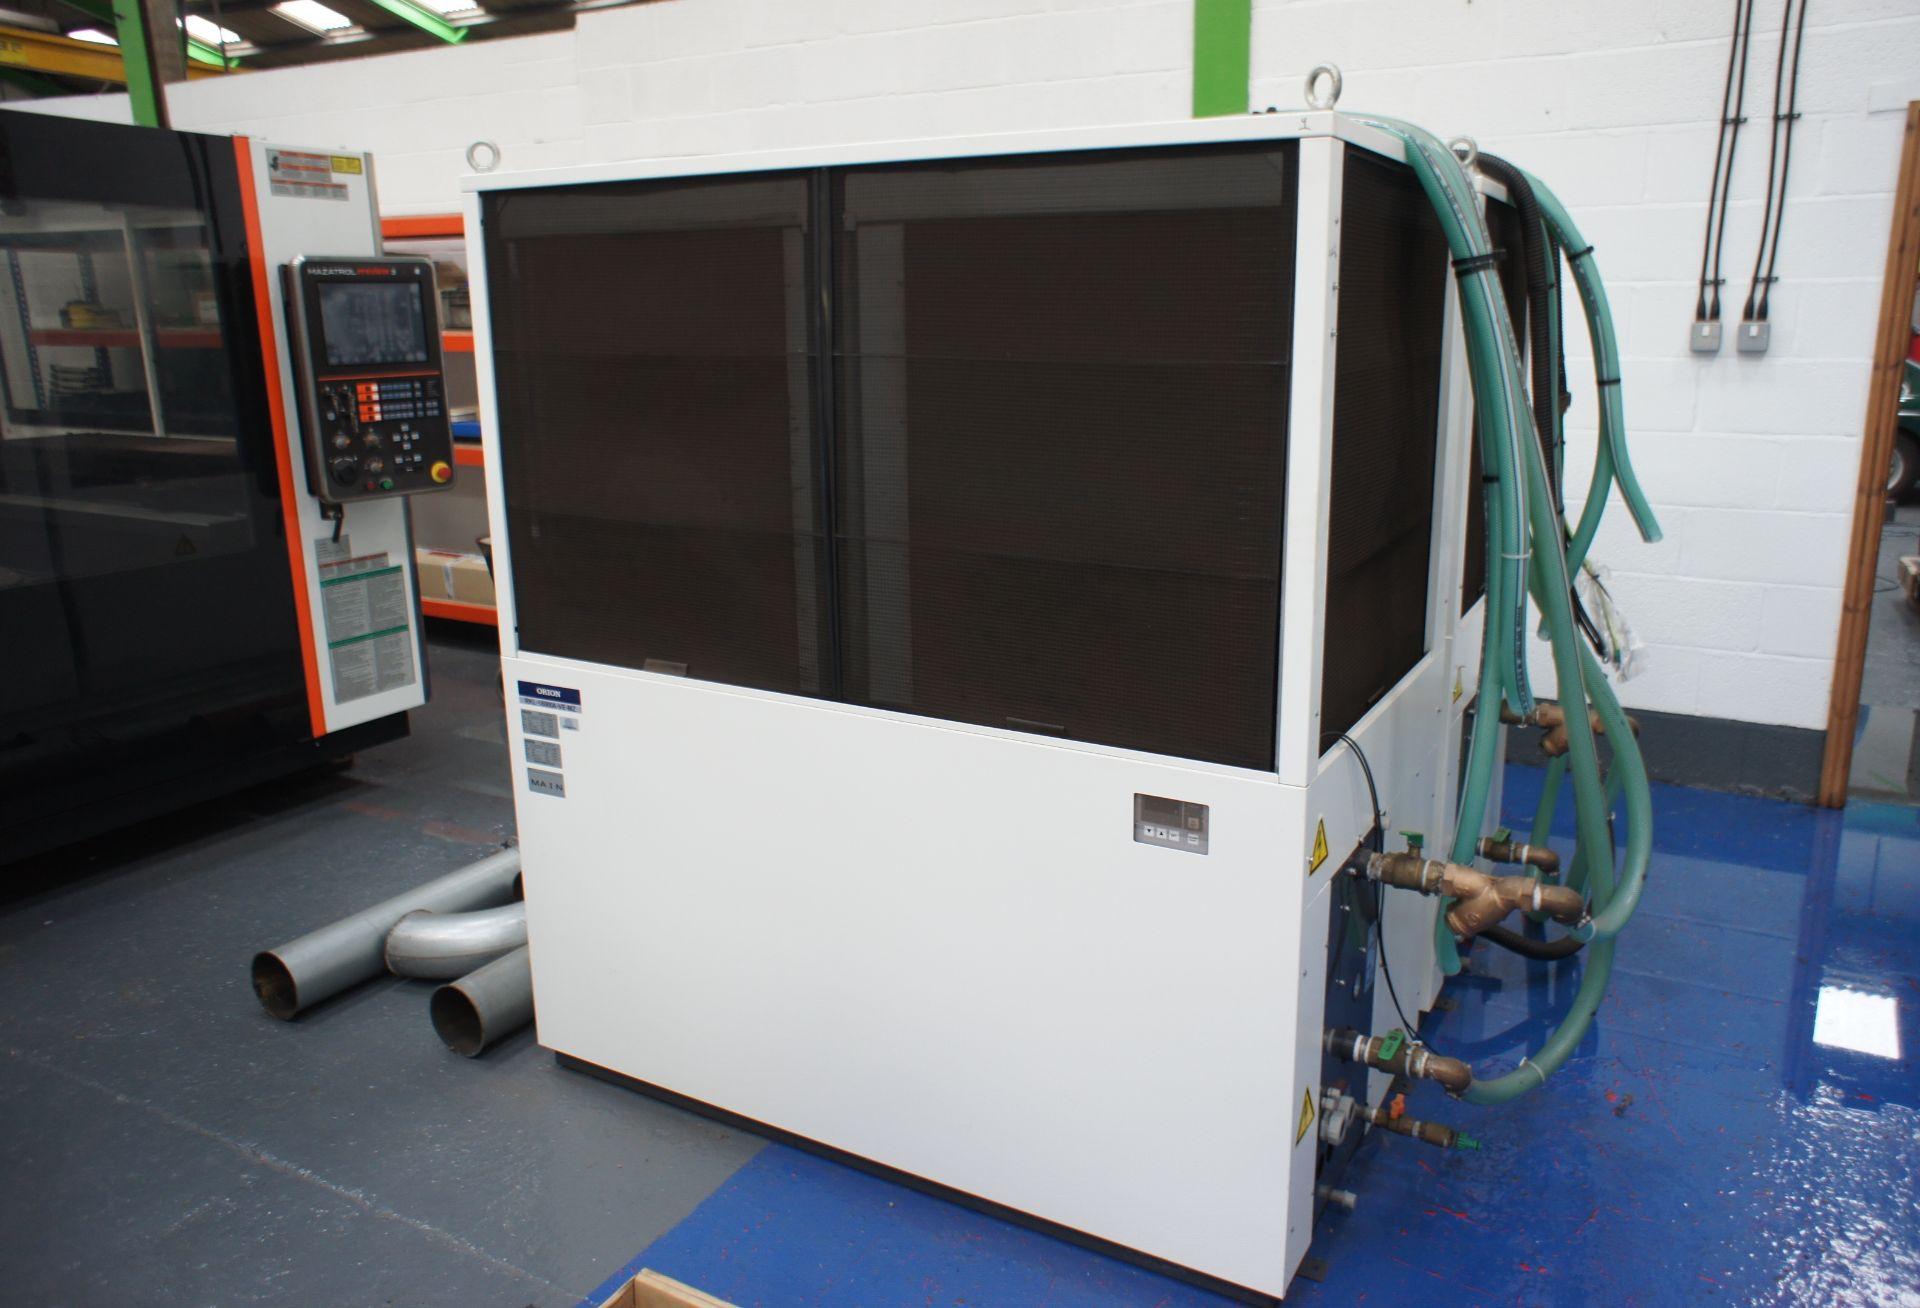 2015 - Mazak OptiPlex 4020 II Laser Cutting Machin - Image 13 of 15